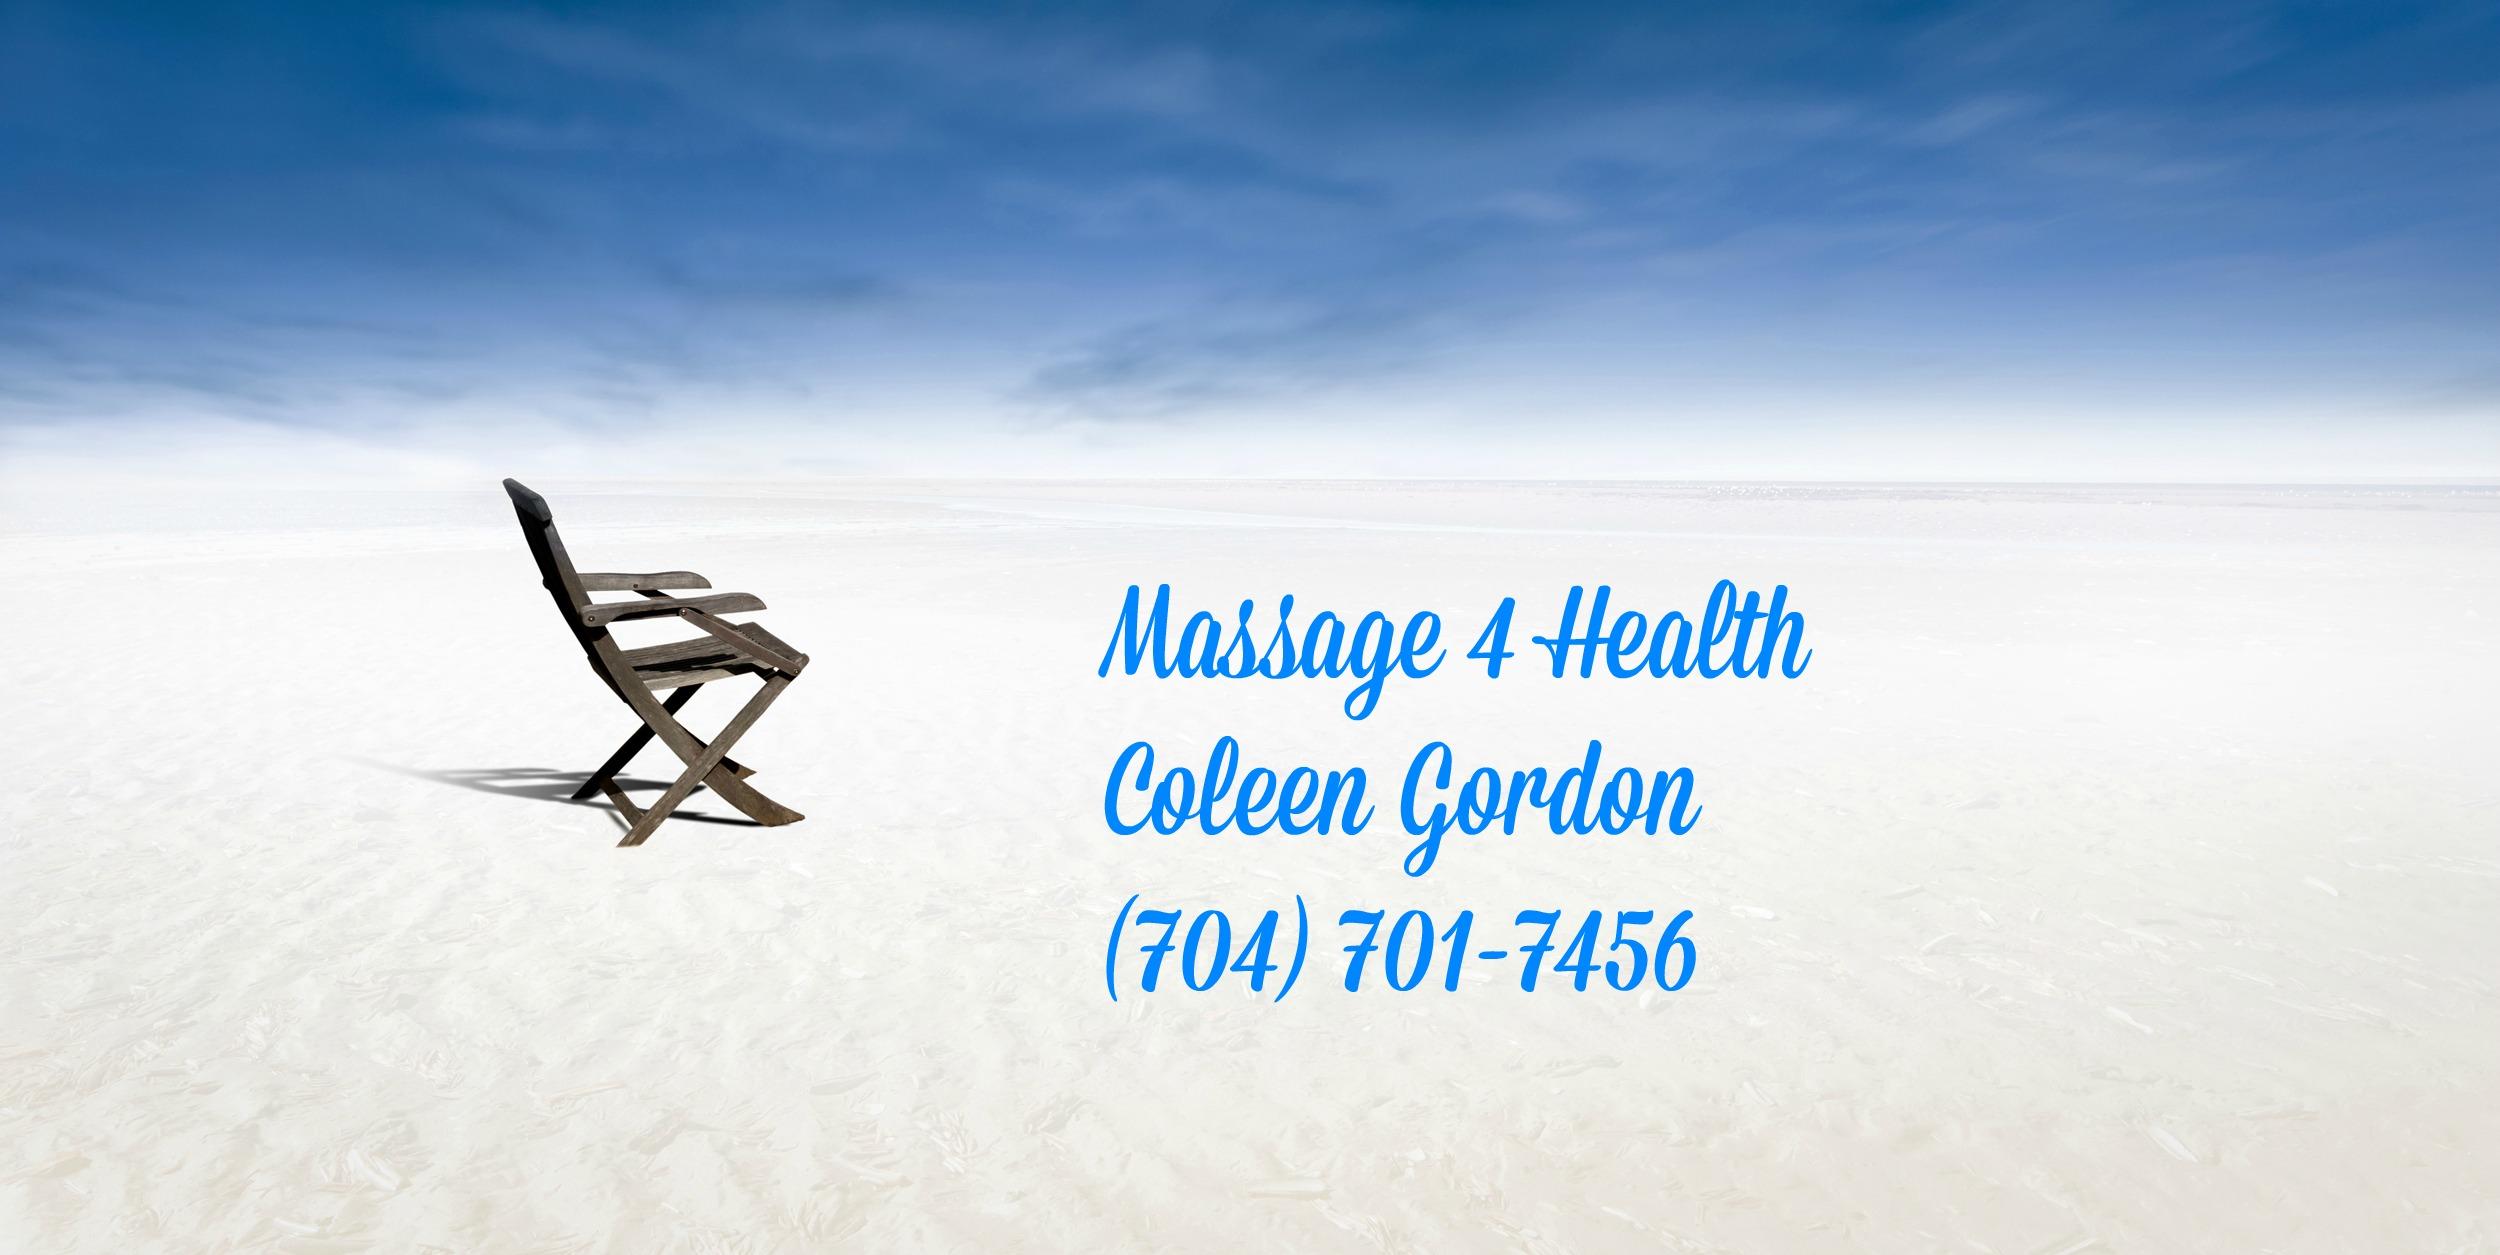 Massage Therapist in Charlotte